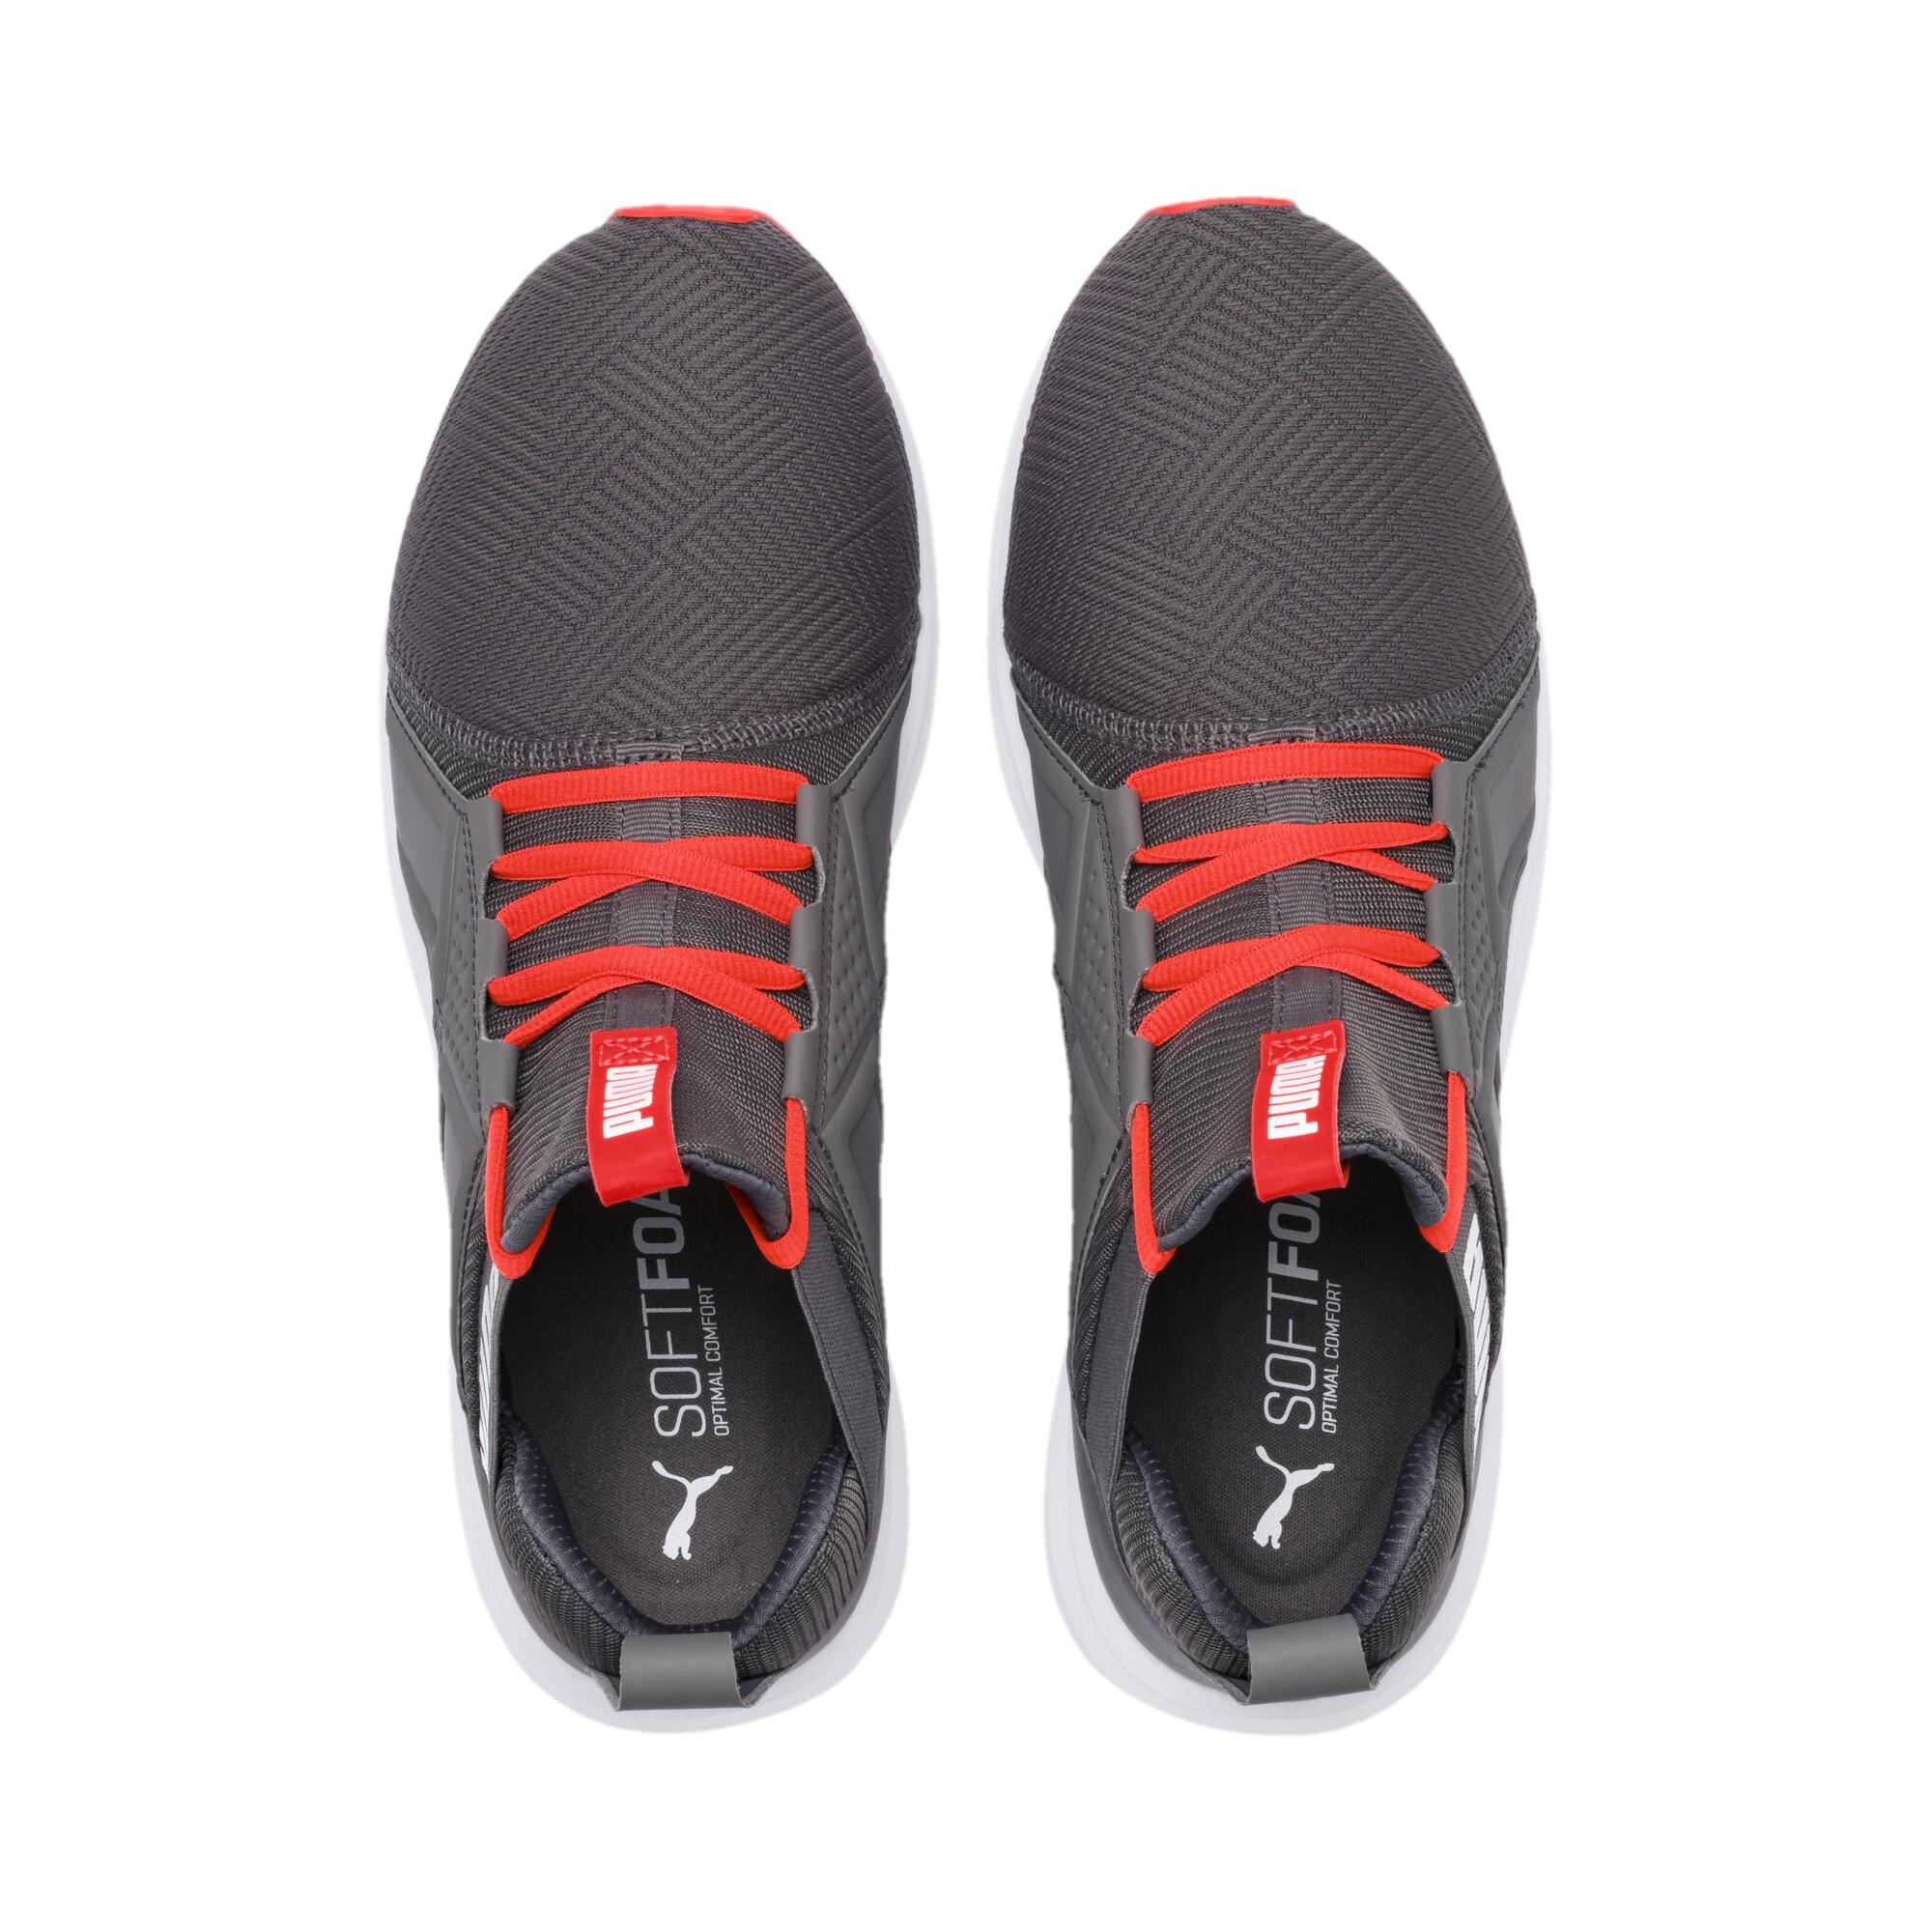 PUMA-Enzo-Geo-Men-s-Sneakers-Men-Shoe-Running thumbnail 14